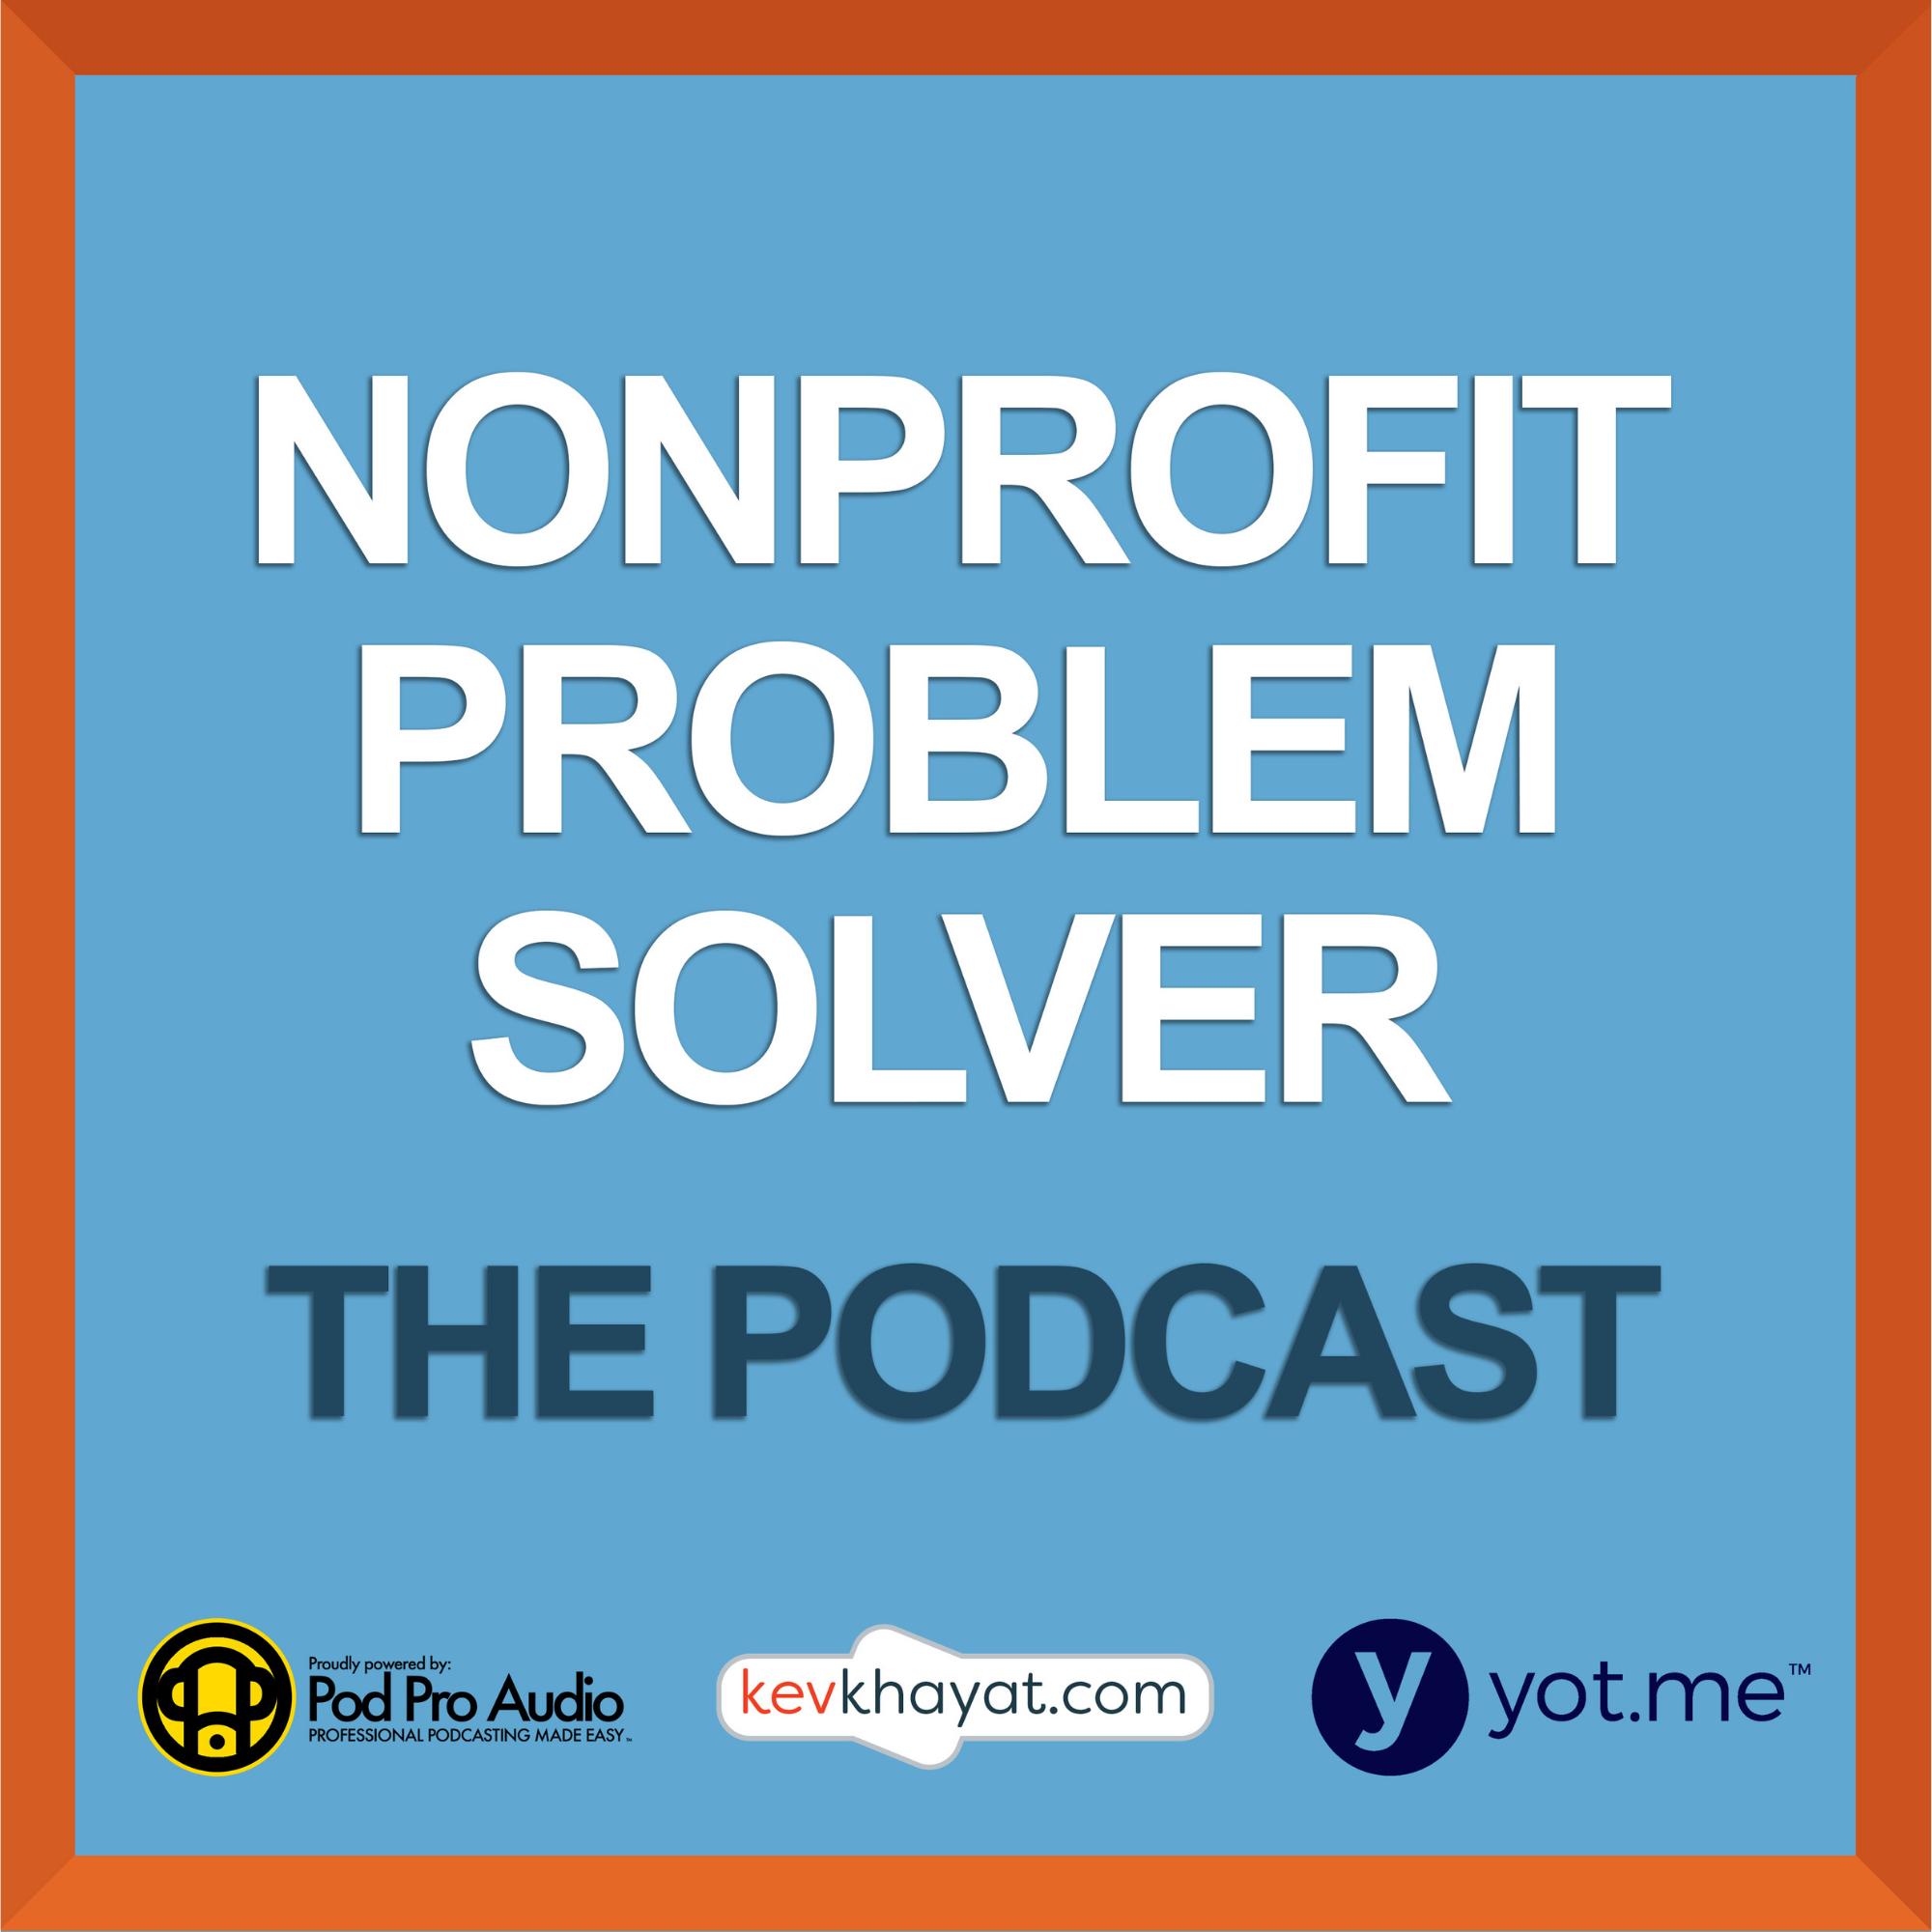 Artwork for podcast Nonprofit Problem Solver